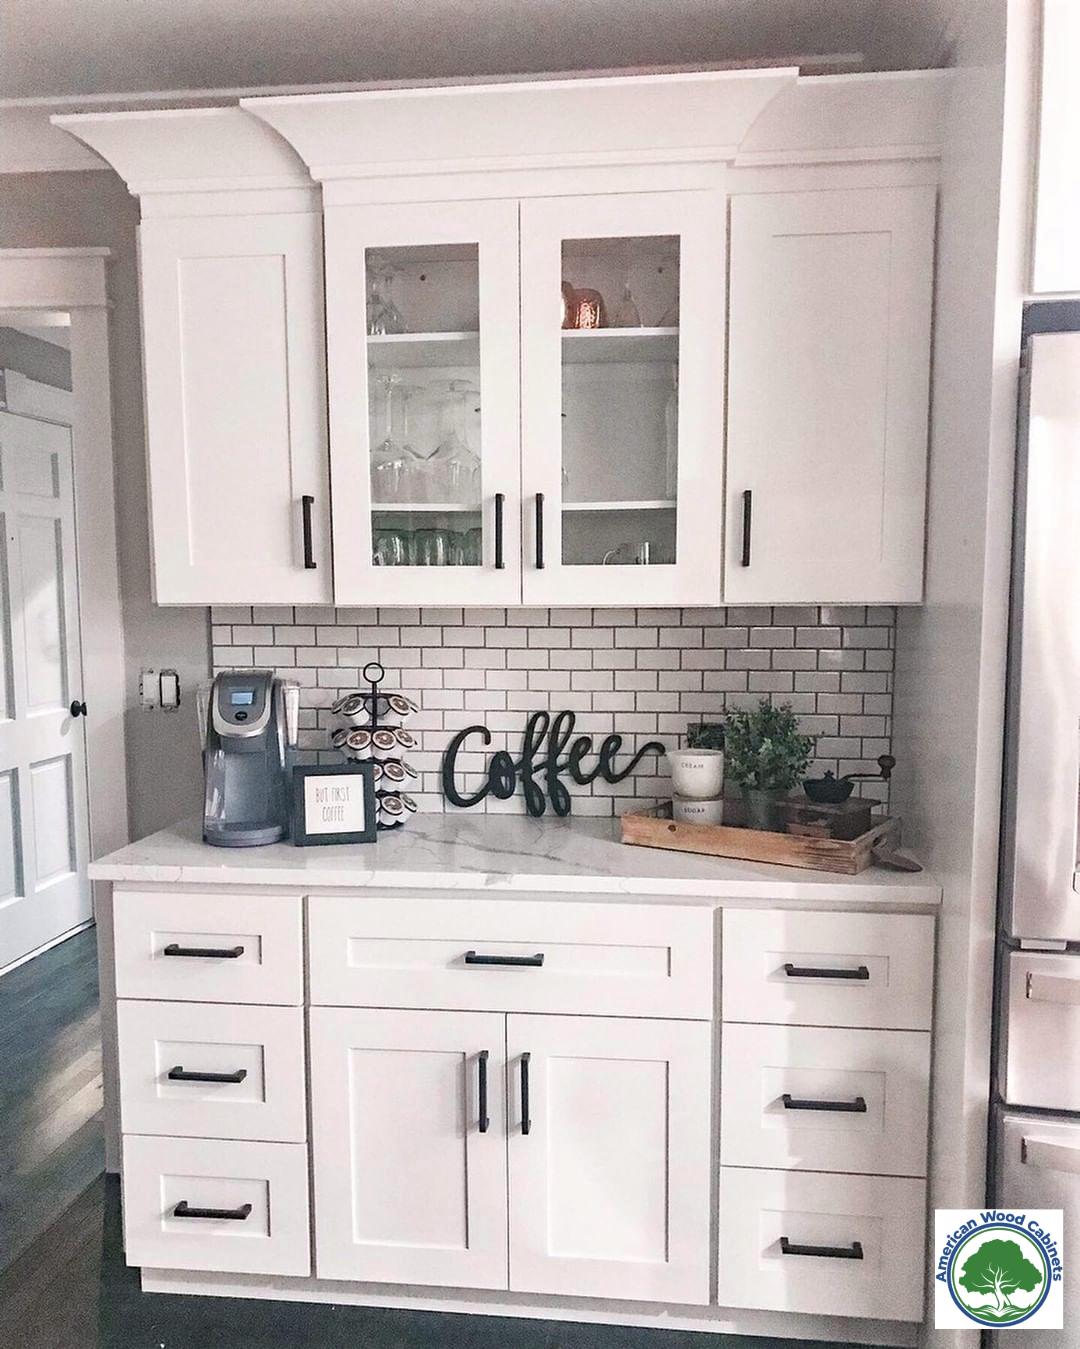 White Shaker Kitchen Cabinets Shaker Style Kitchen Cabinets White Shaker Kitchen Cabinets White Shaker Kitchen